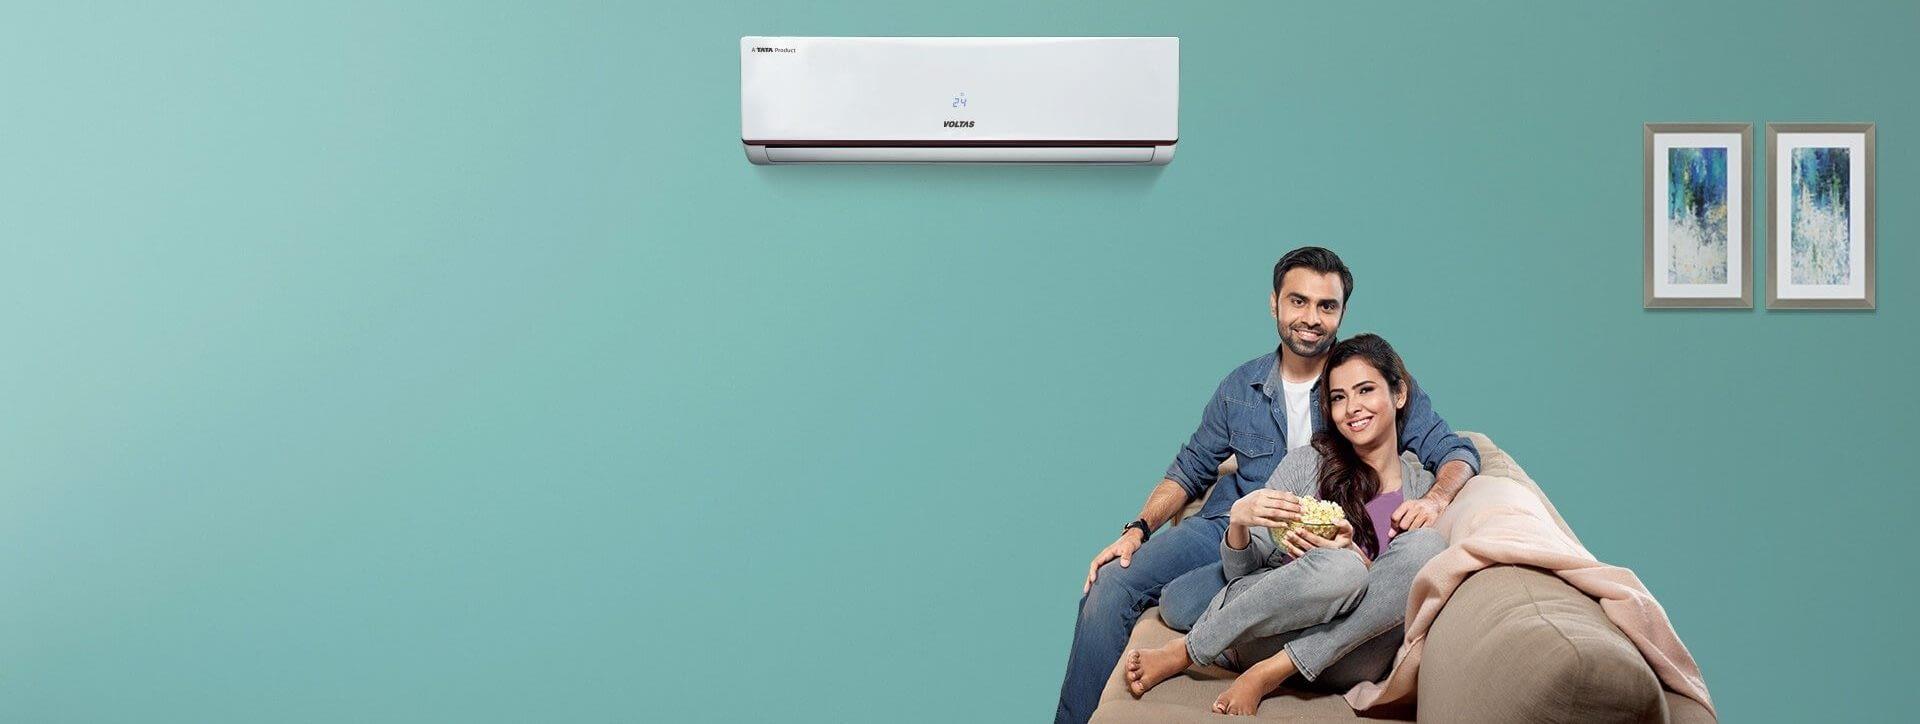 Best Hitachi Air Conditioners